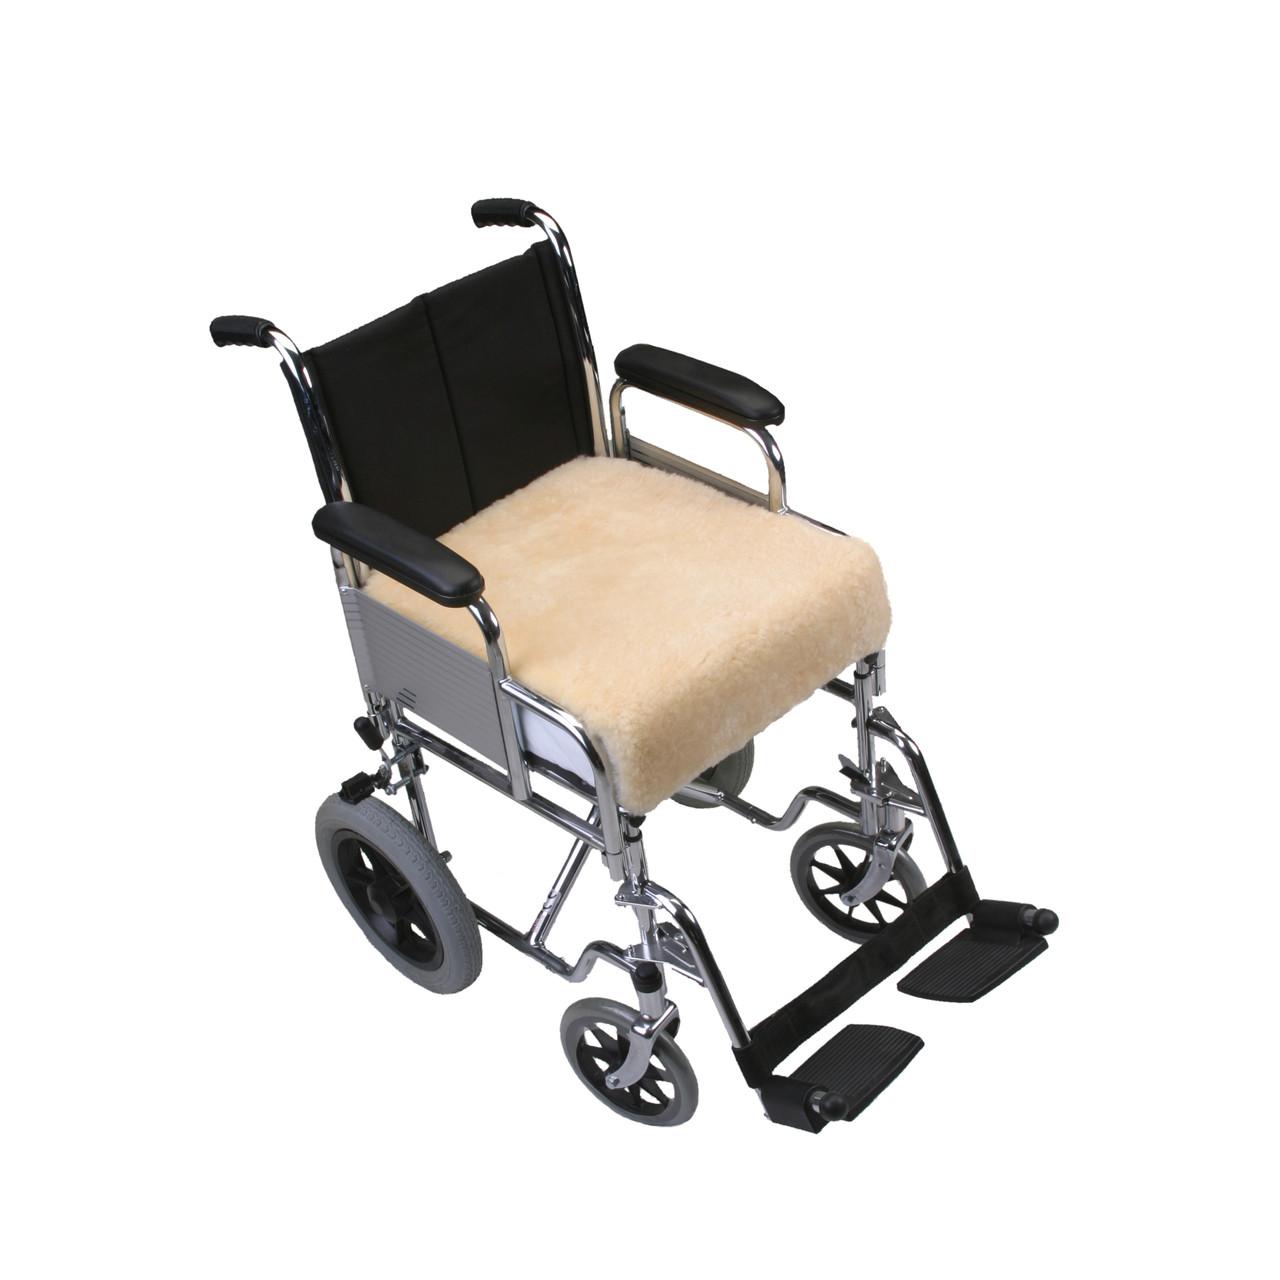 Wheelchair Sheepskin Padded Seat